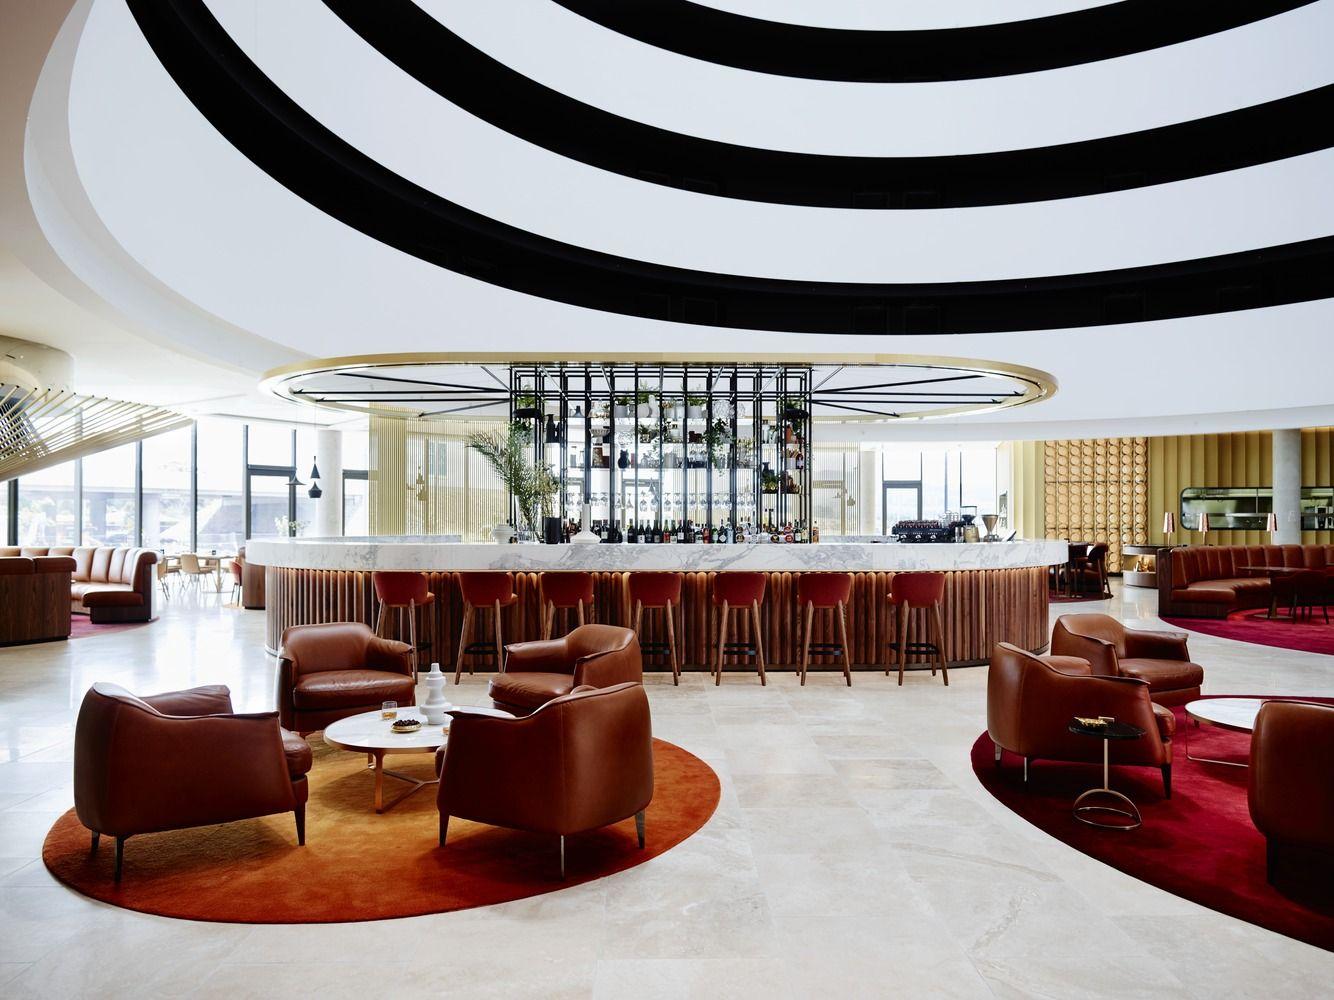 Gallery of Canberra Hotel \/ Bates Smart - 20  Vibe hotel, Australian interior design, Interior